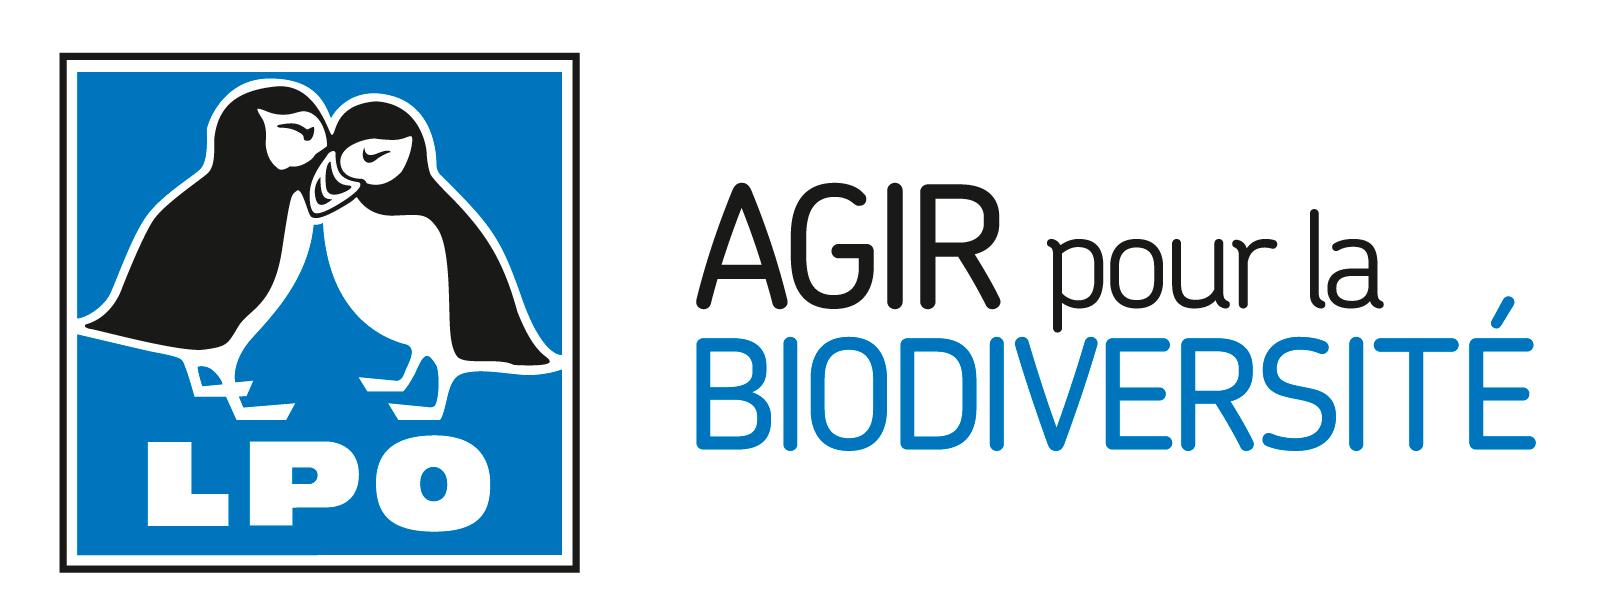 https://cdnfiles1.biolovision.net/www.faune-guyane.fr/userfiles/Documentsdivers/news/logoLPOAgirpourlabioFranceb.png